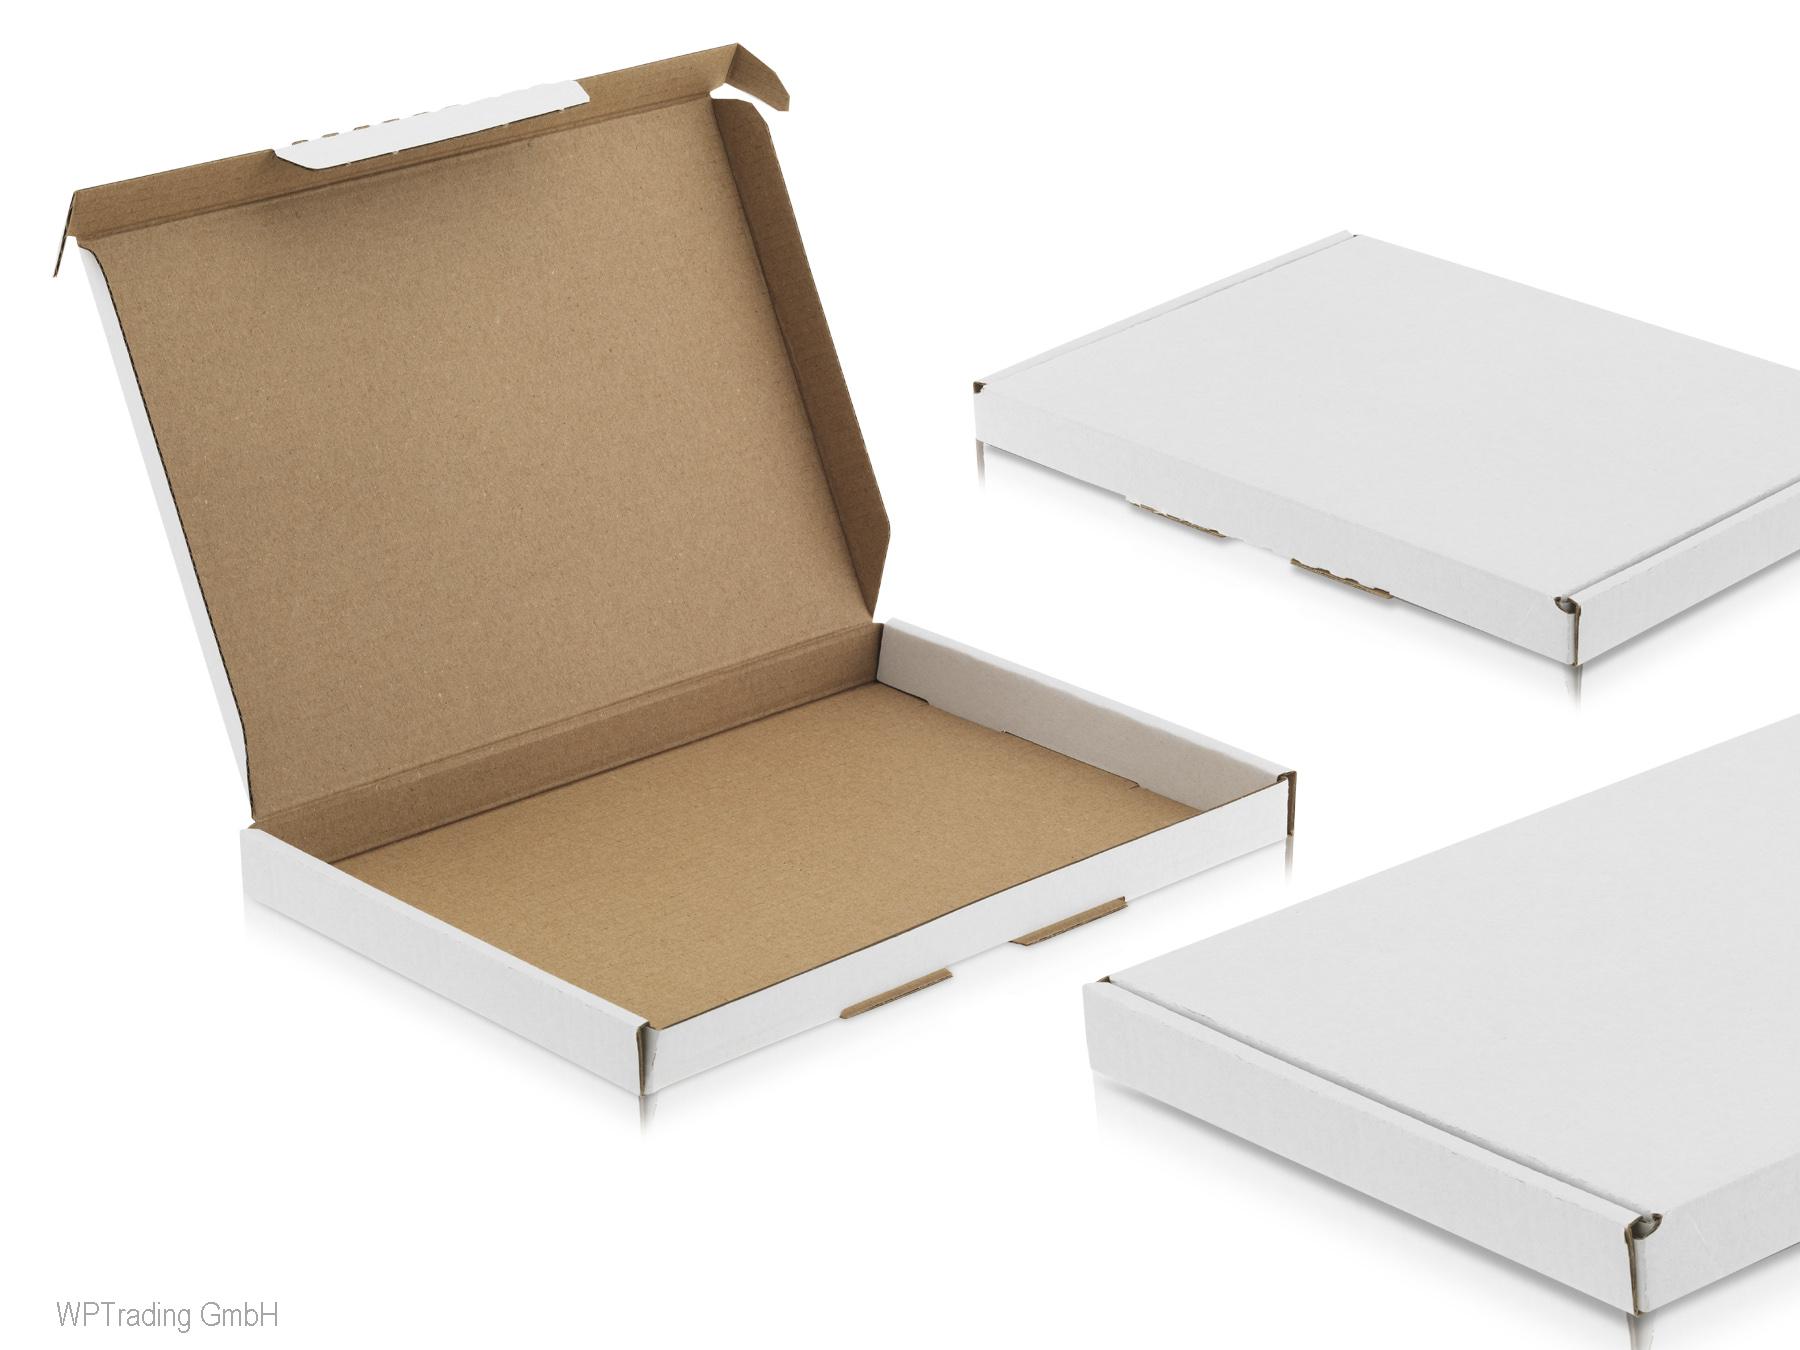 Versandhülse 120 Faltkartons 700 x 150 x 150 mm Päckchen// Paket für langes